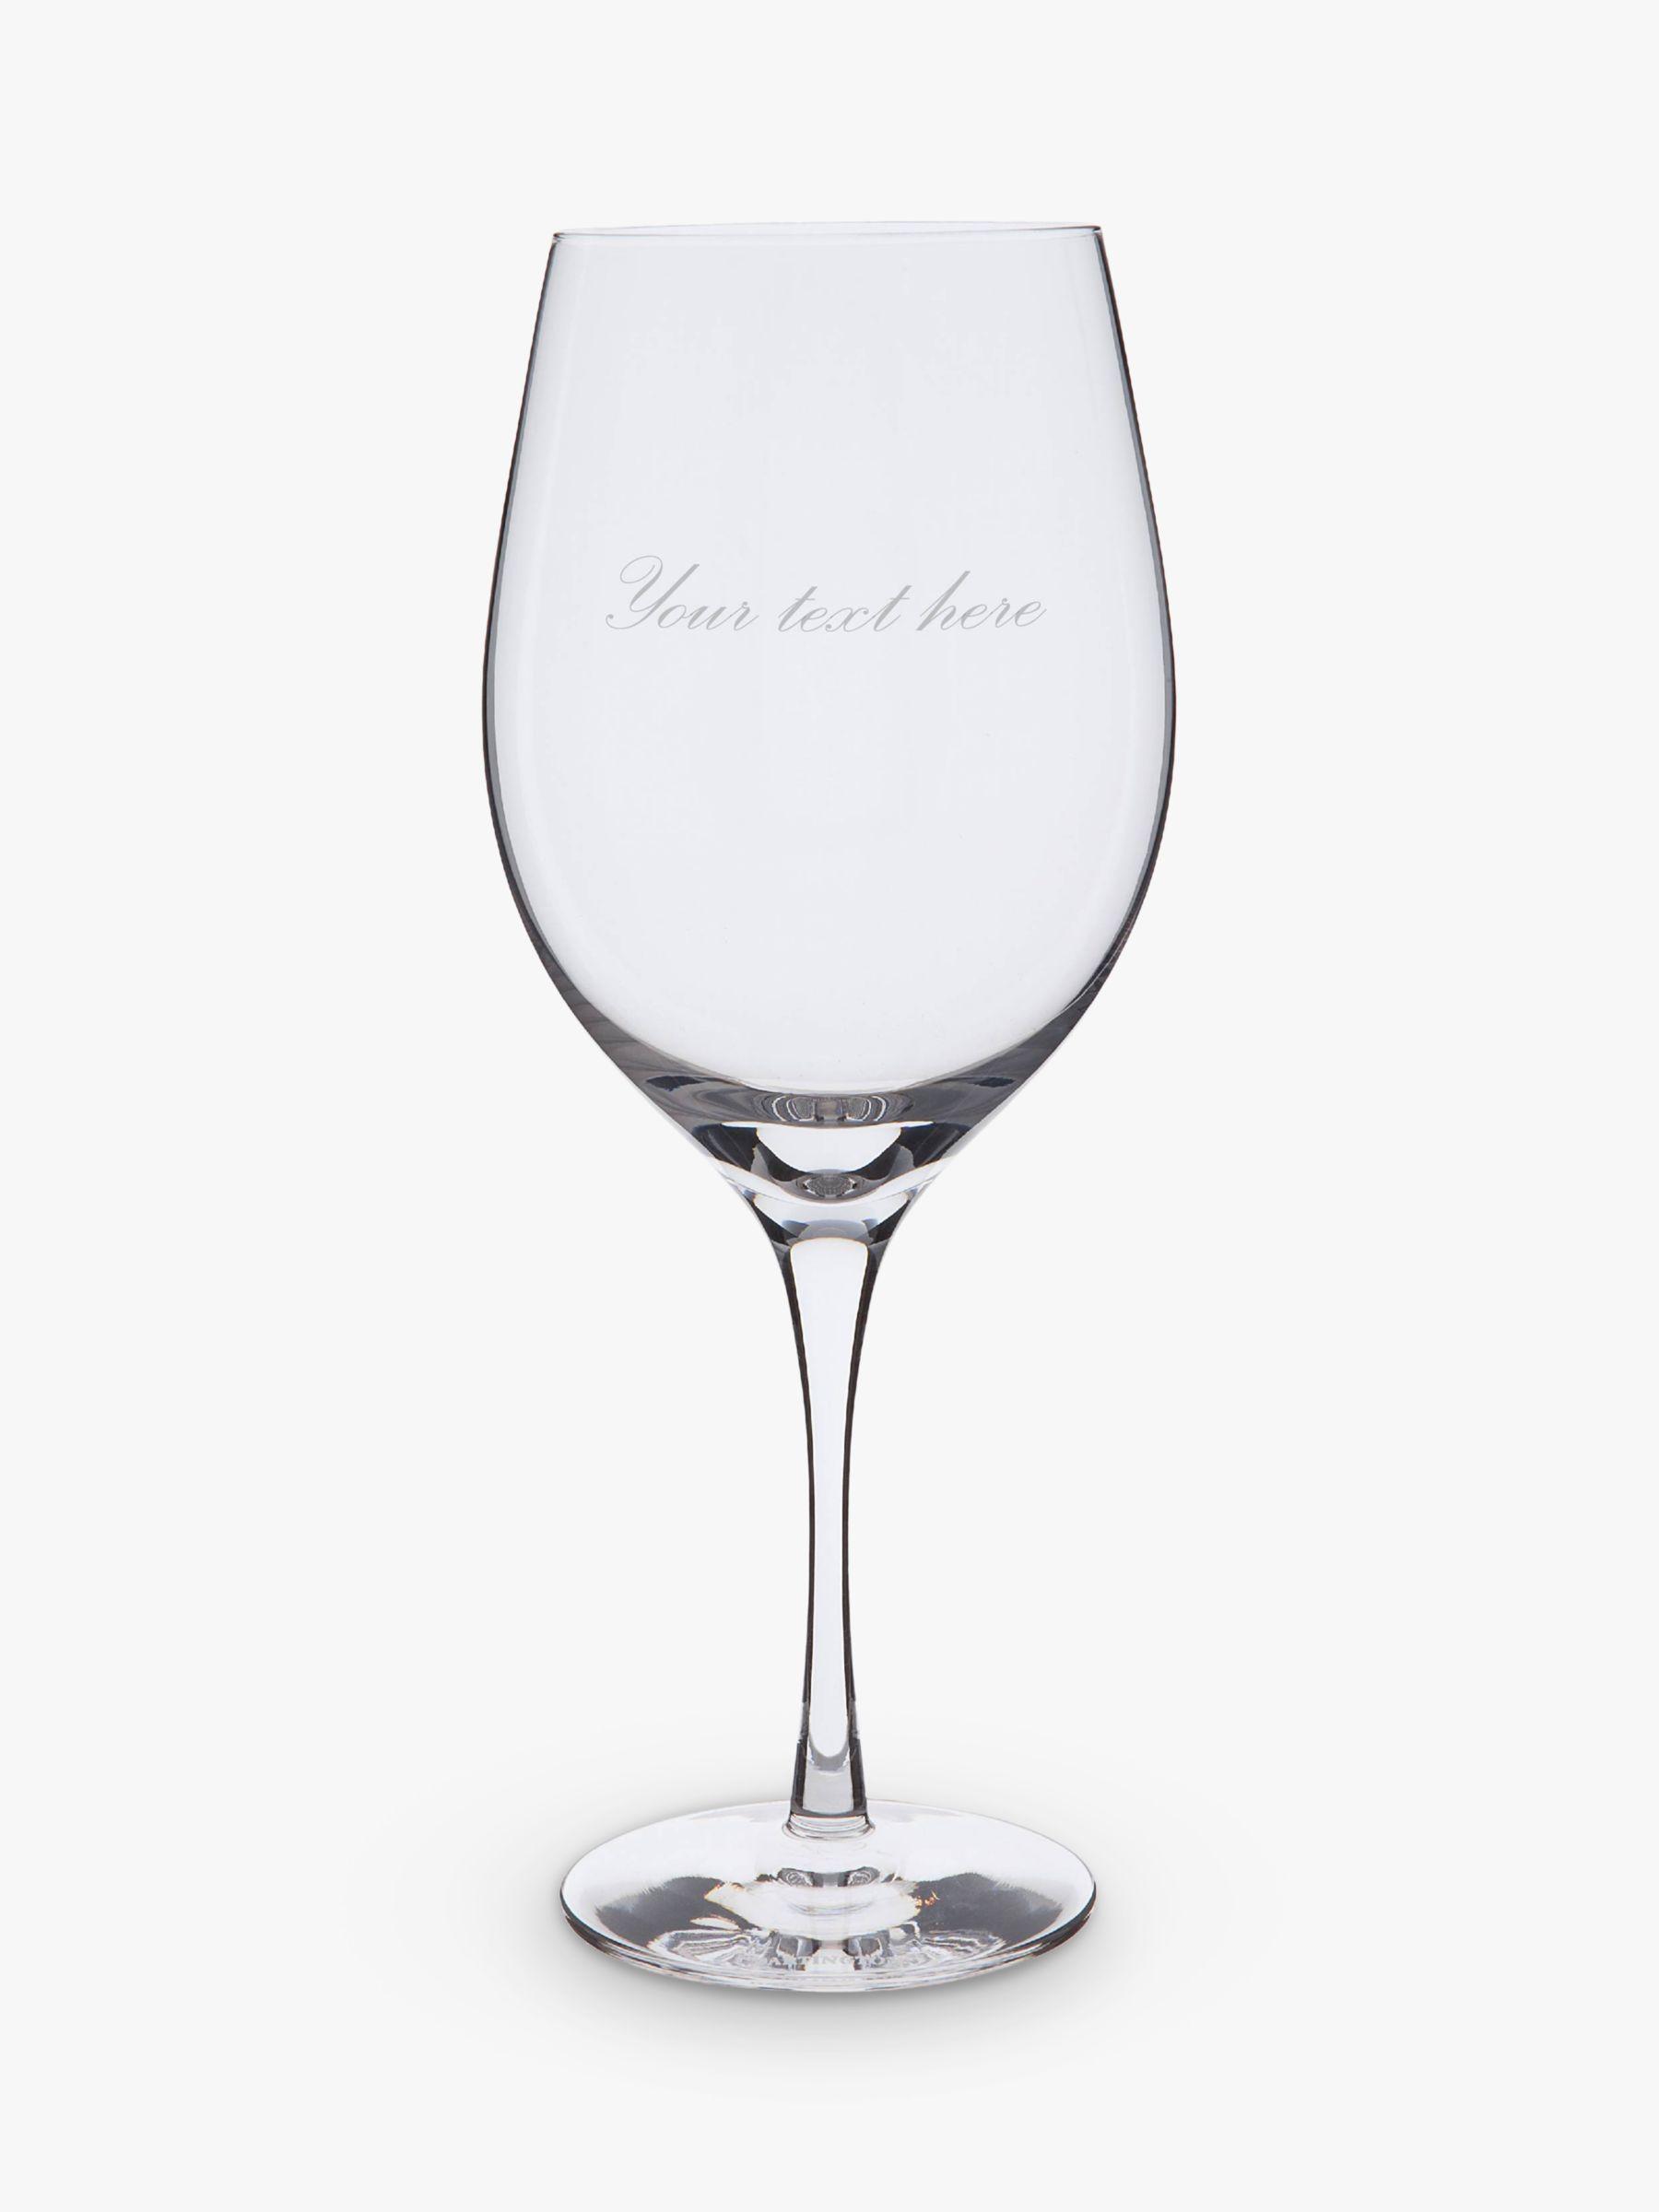 Dartington Crystal Dartington Crystal Personalised Bordeaux Red Wine Glass, Palace Script Font, 600ml